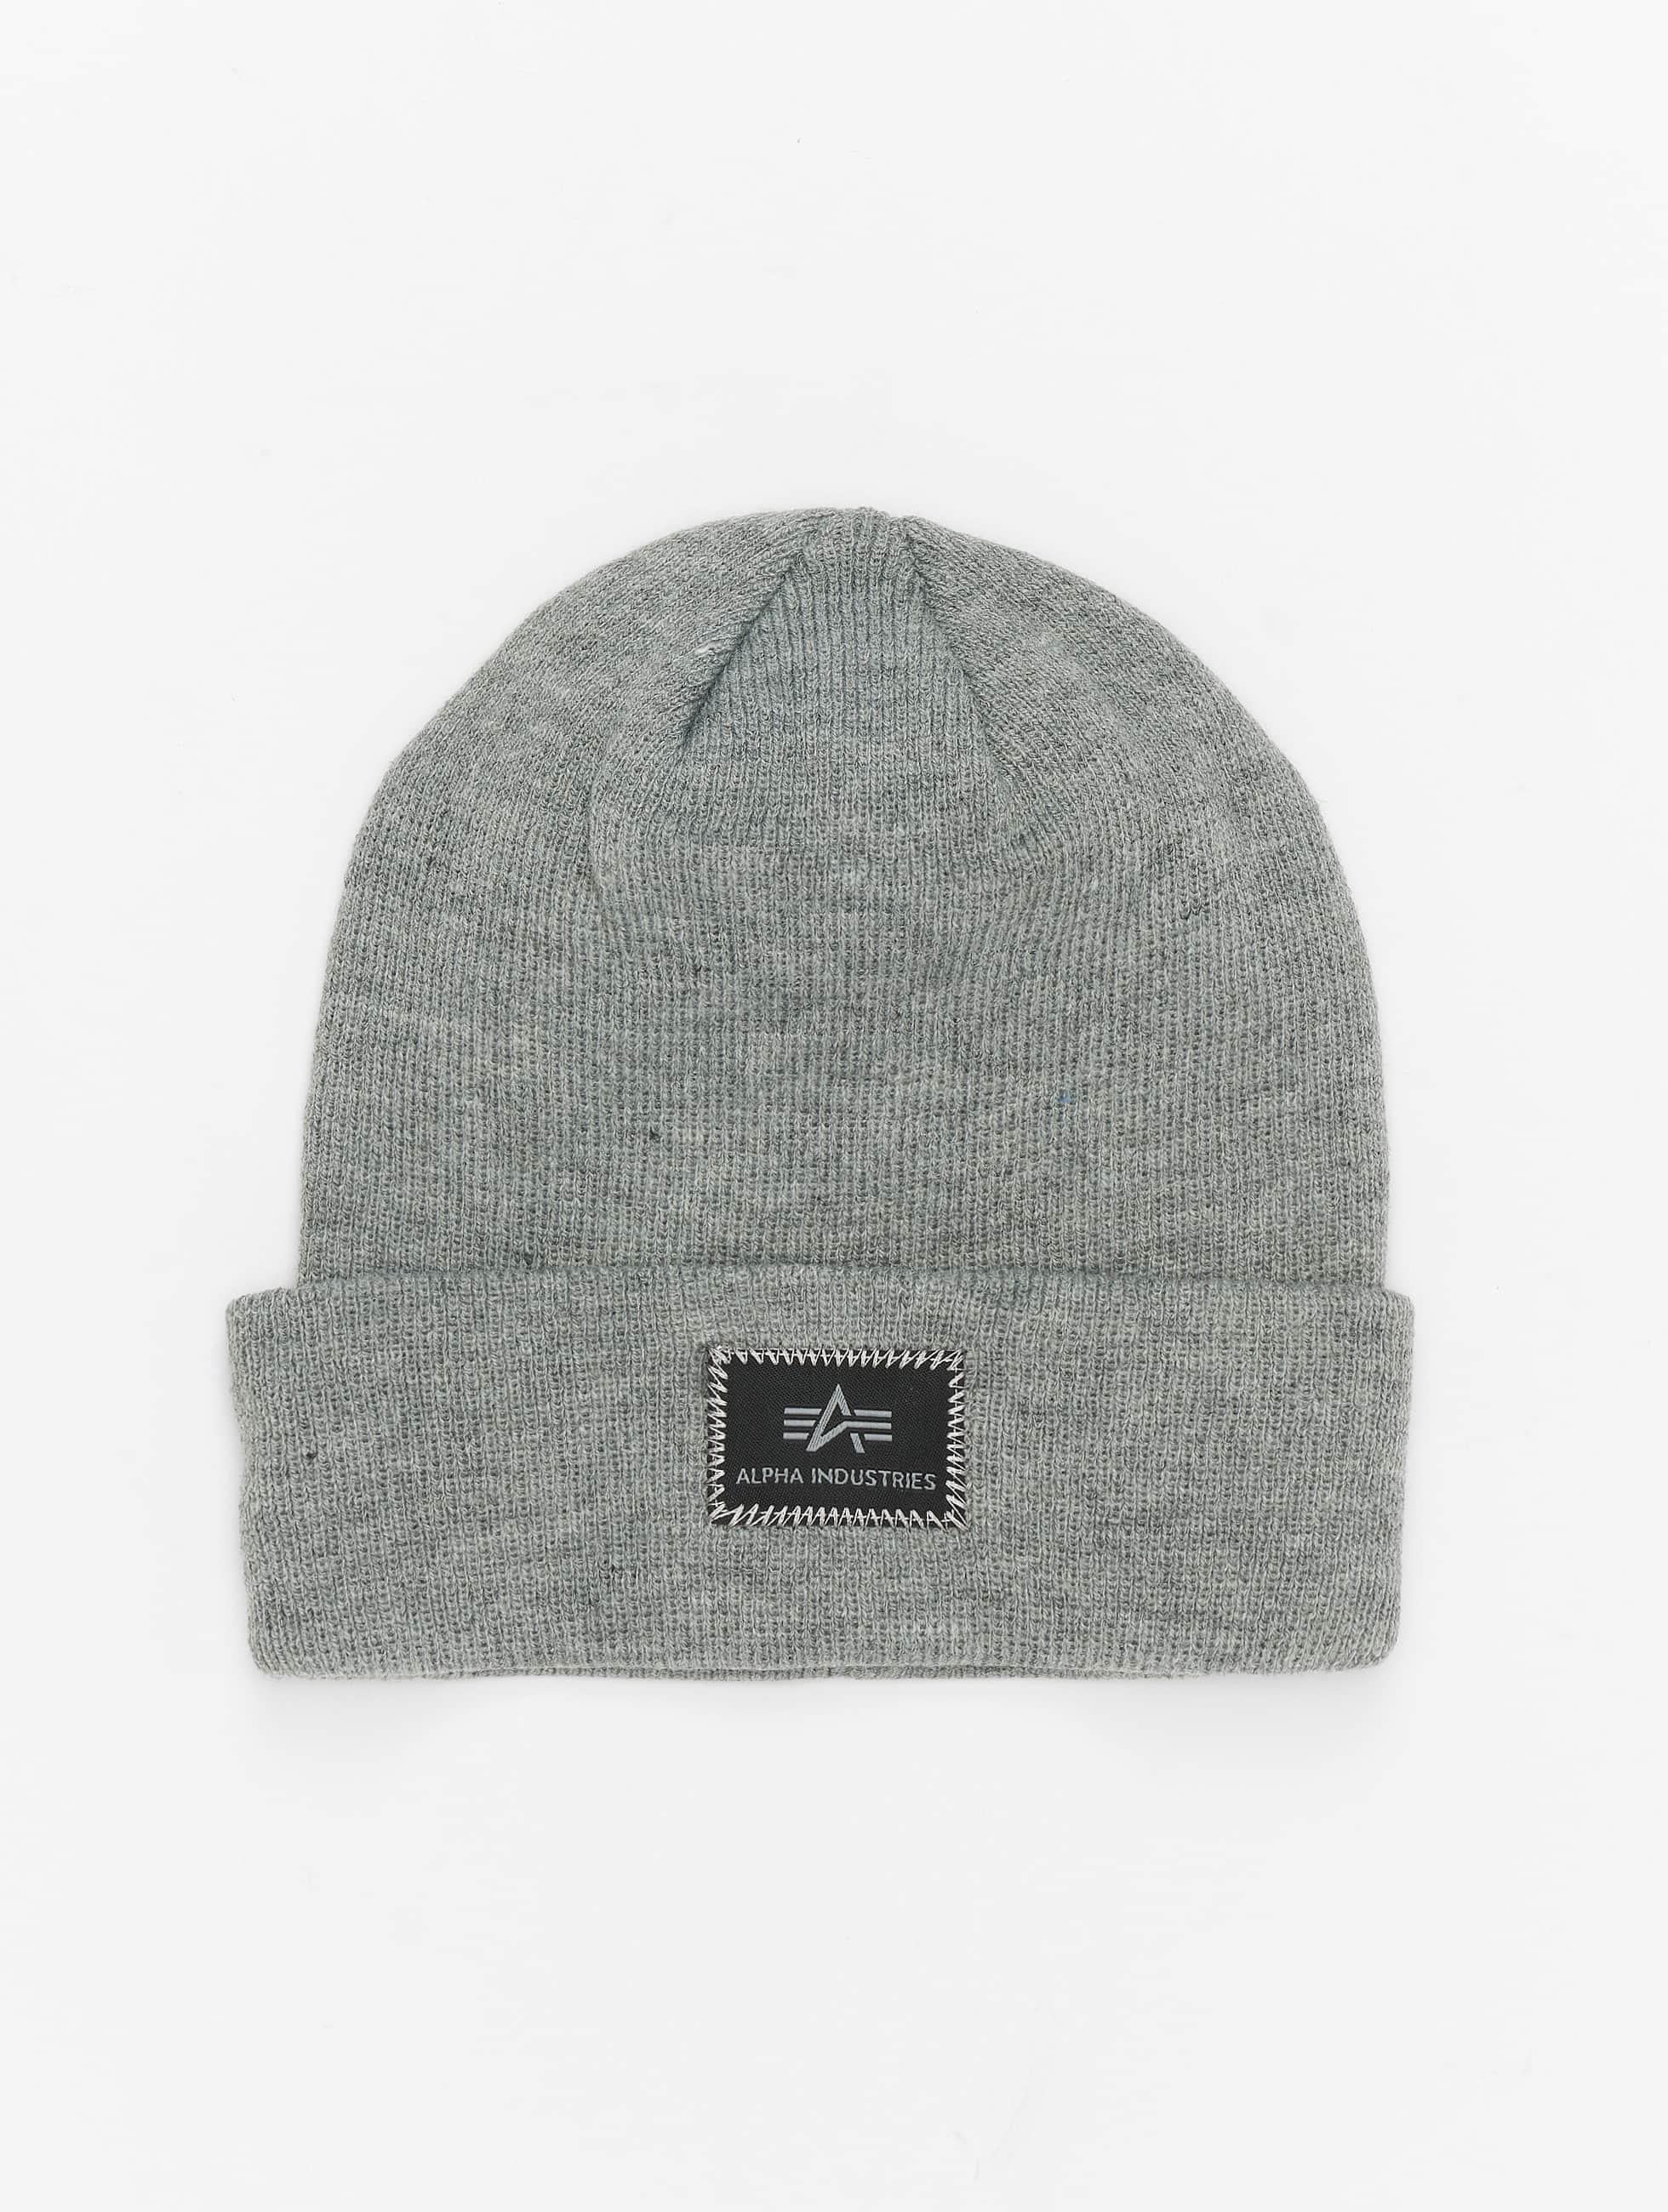 Alpha Industries Hat-1 X-Fit gray